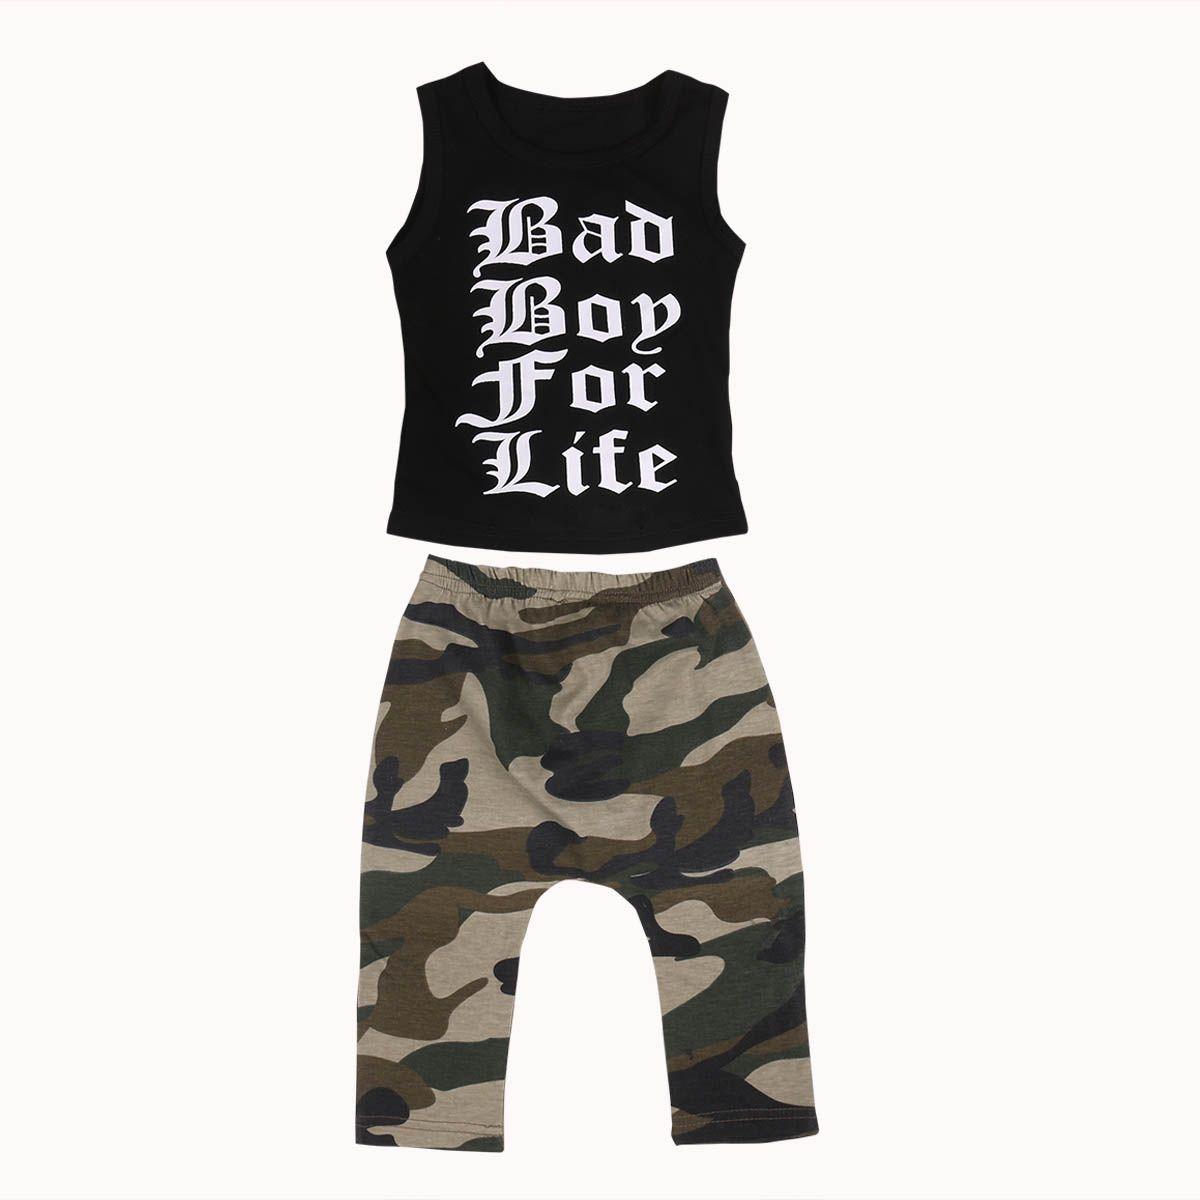 8c1a0a1fa 2017 Summer Kids Boy Clothing Set Sleeveless Letter Print Vest T-shirt Tops+ Camouflage Pant 2PCS Children Clothes 0-4Y #Affiliate